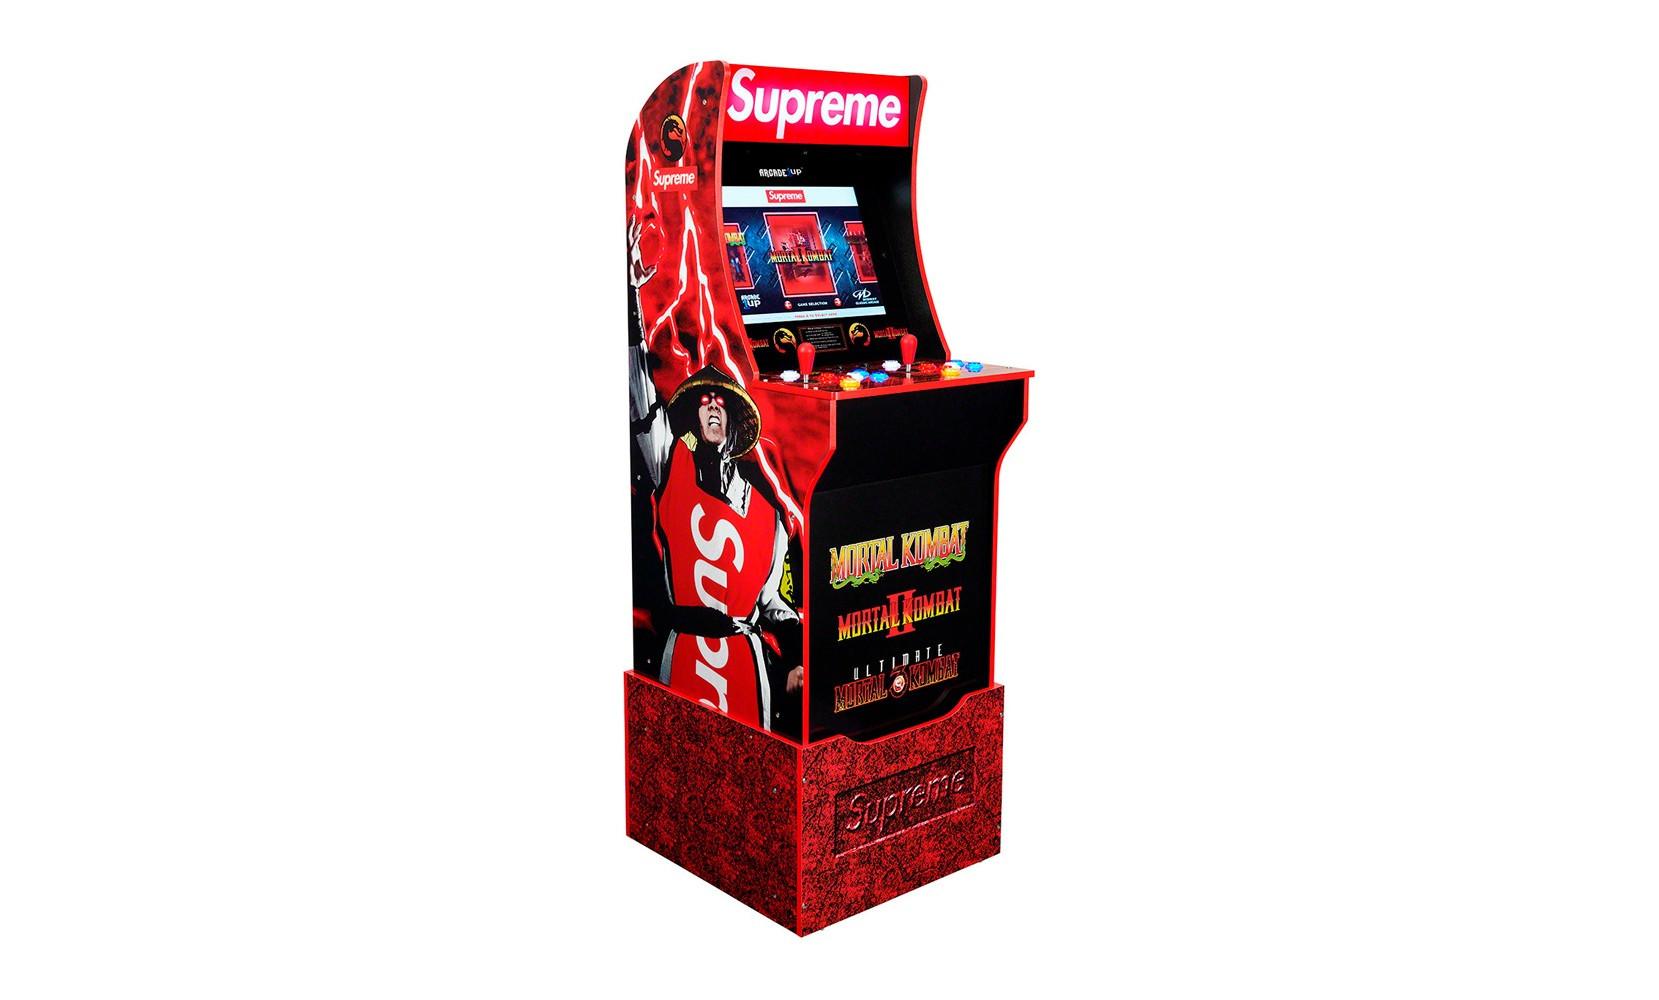 Supreme Mortal Kombat Arcade Cabinet